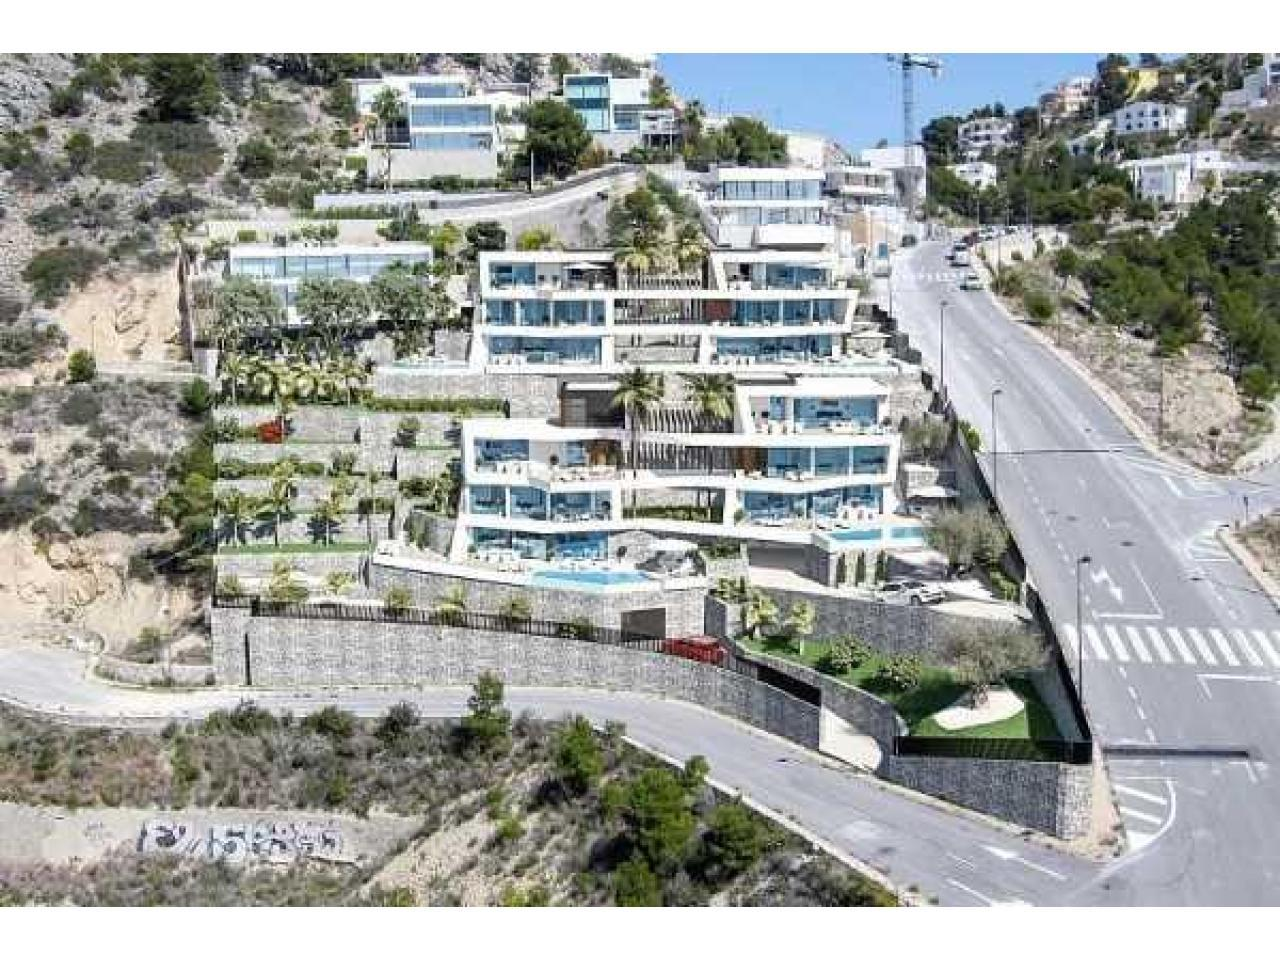 Недвижимость в Испании, Новая вилла с видами на море от застройщика в Альтеа,Коста Бланка,Испания - 7